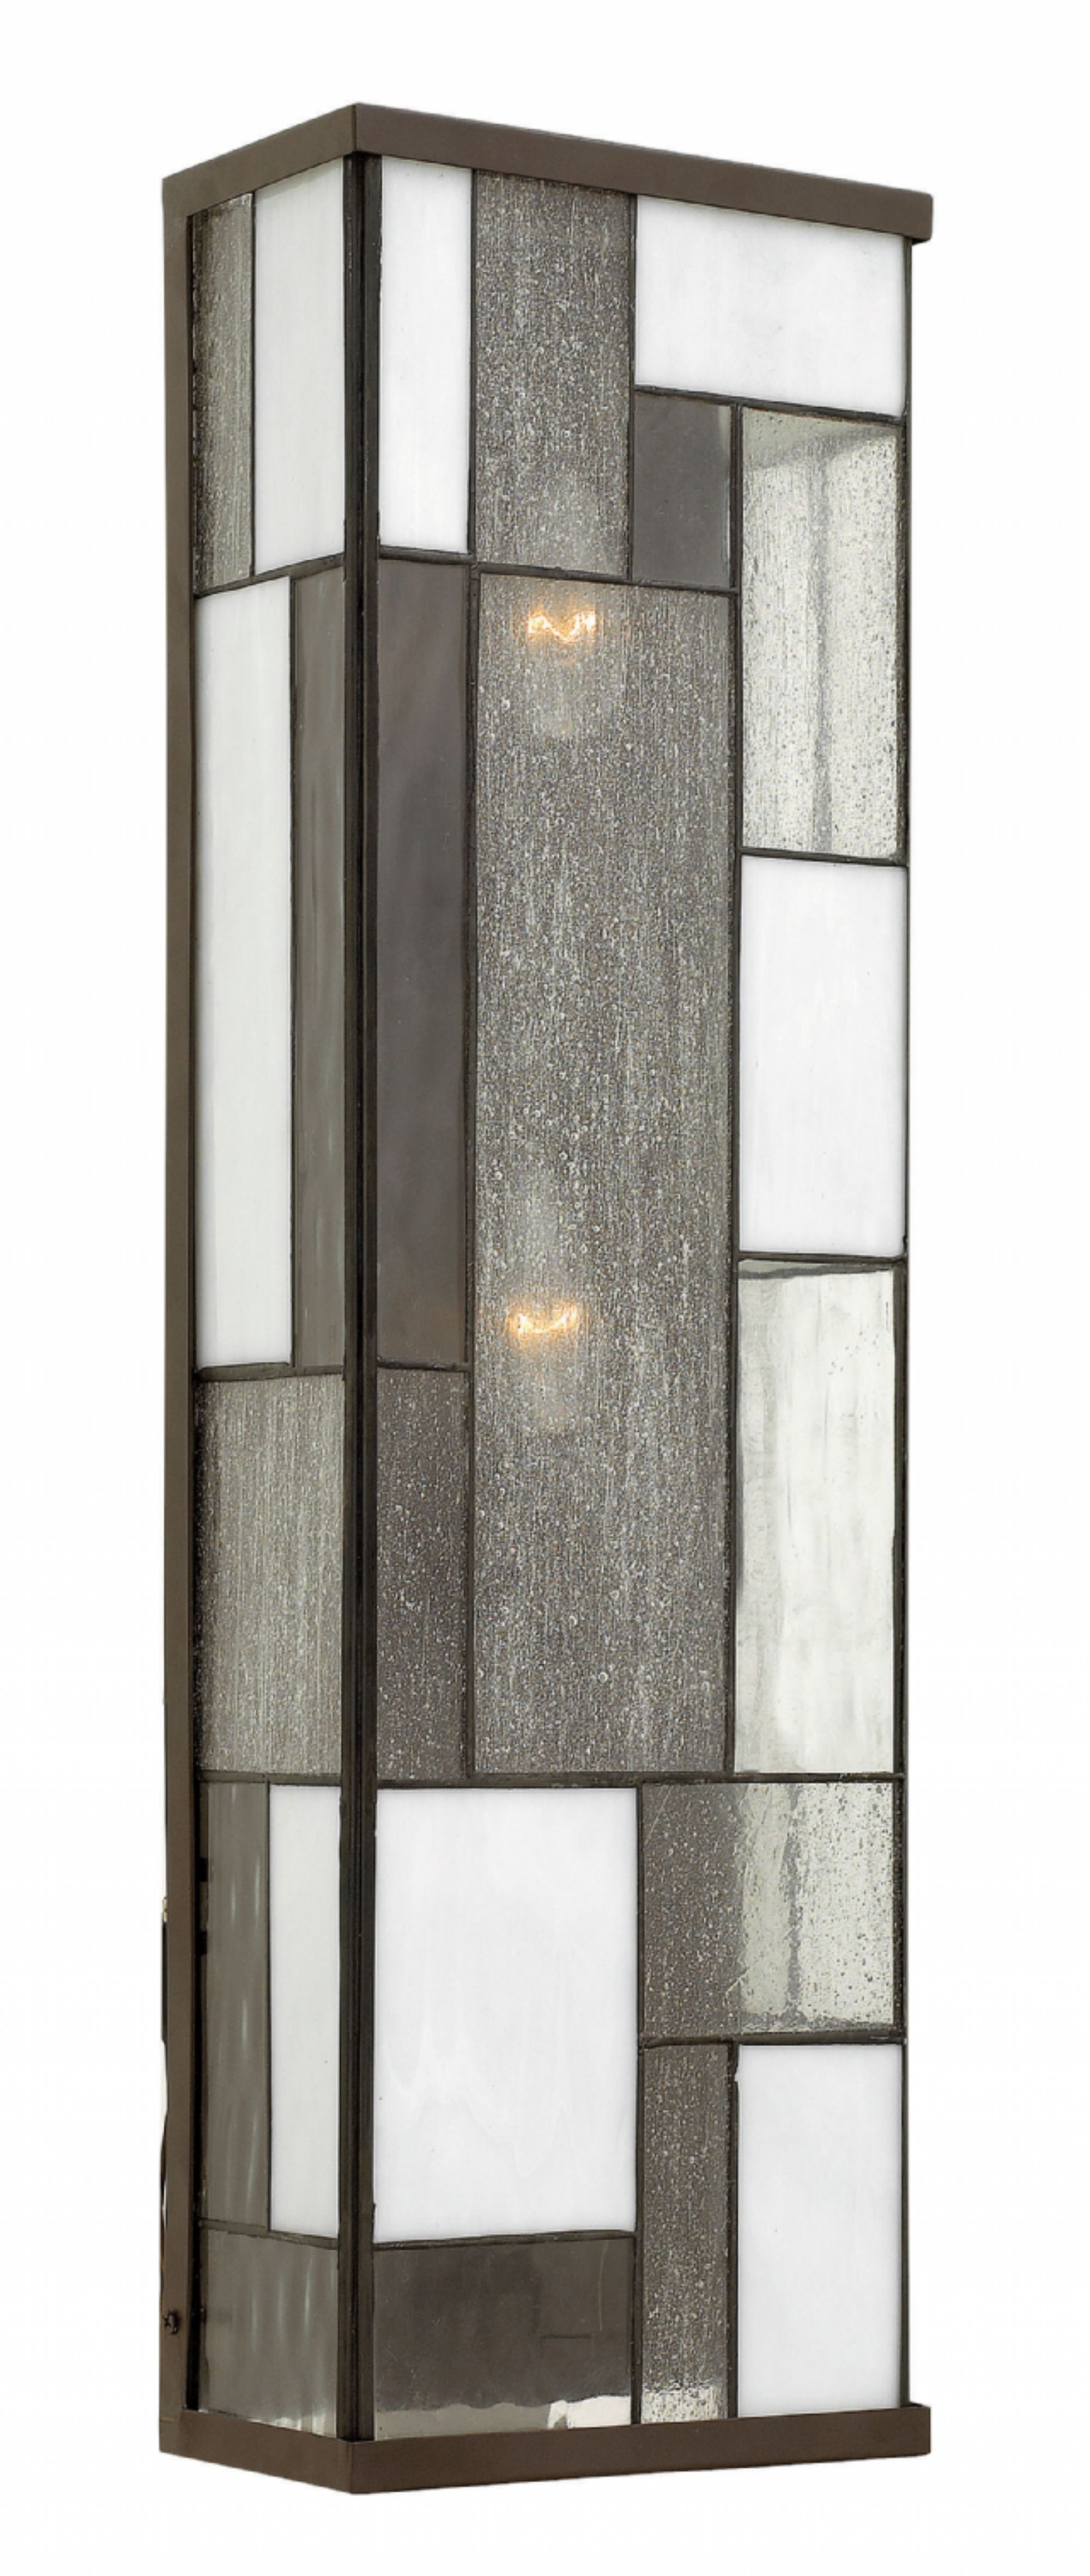 Hinkley Outdoor Wall Lighting For 2018 Buckeye Bronze Mondrian > Exterior Wall Mount (View 6 of 20)